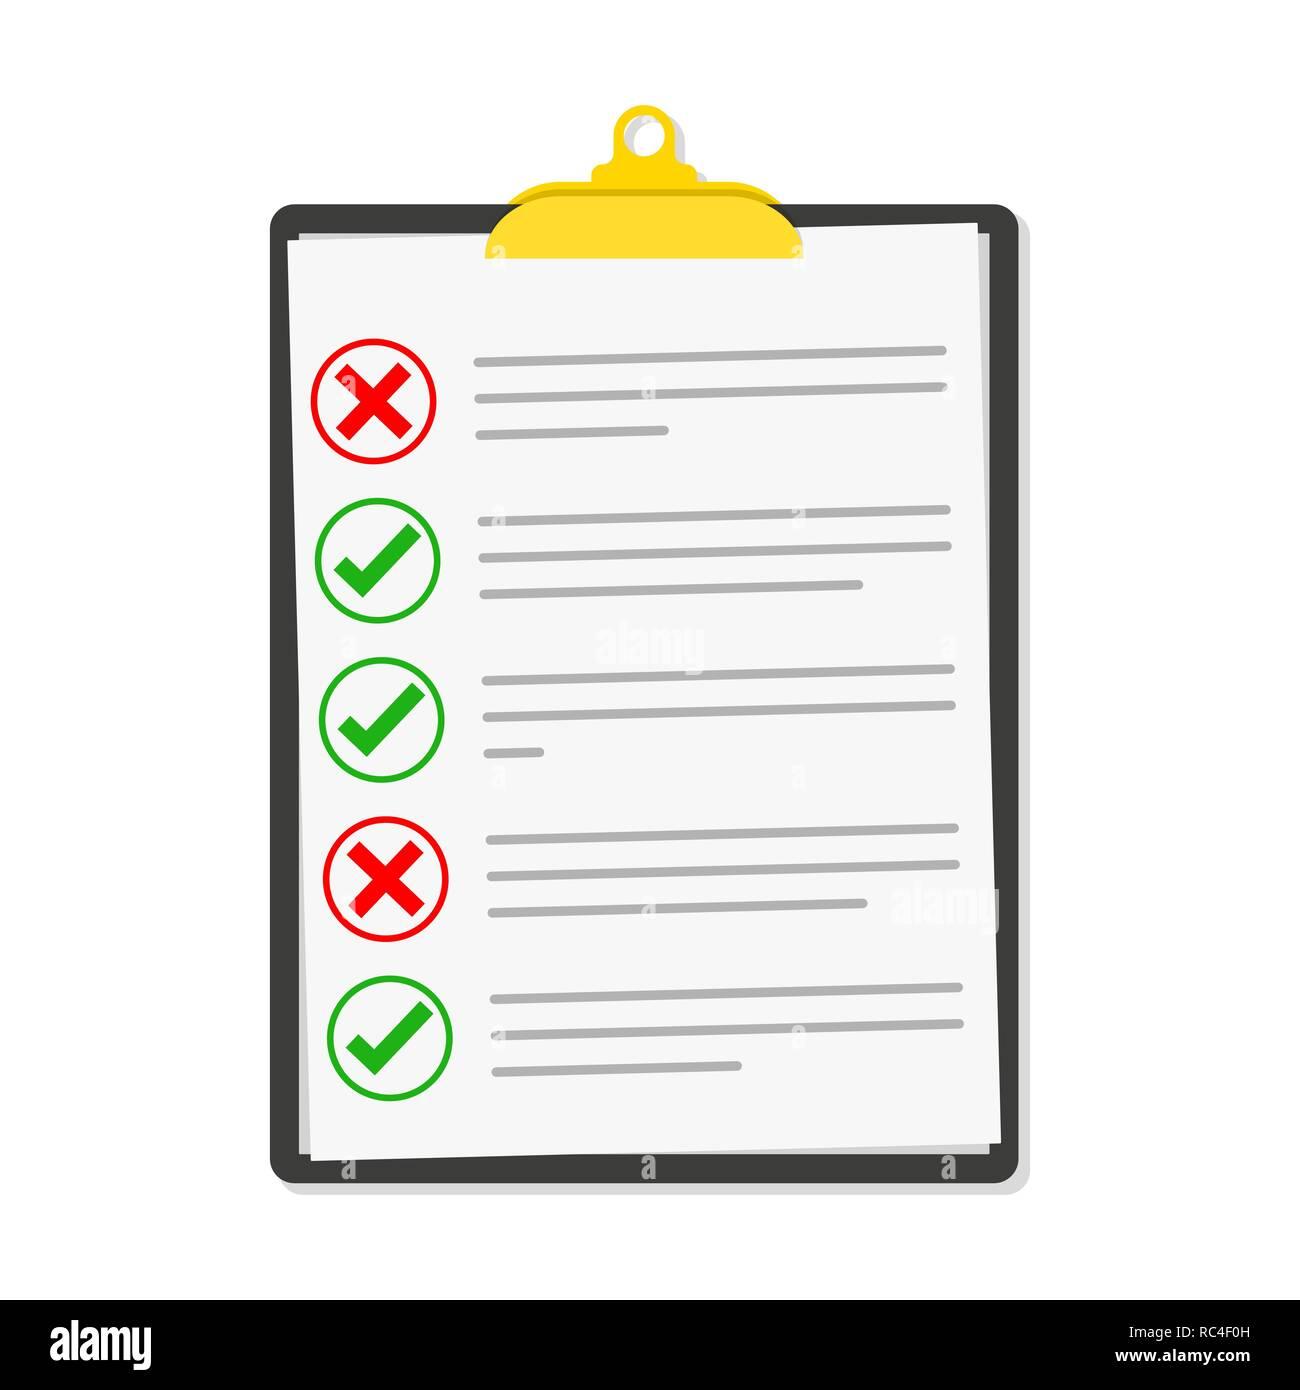 a348ae724 Lista de comprobación aislada. Ilustración vectorial. Checklist  portapapeles en diseño plano